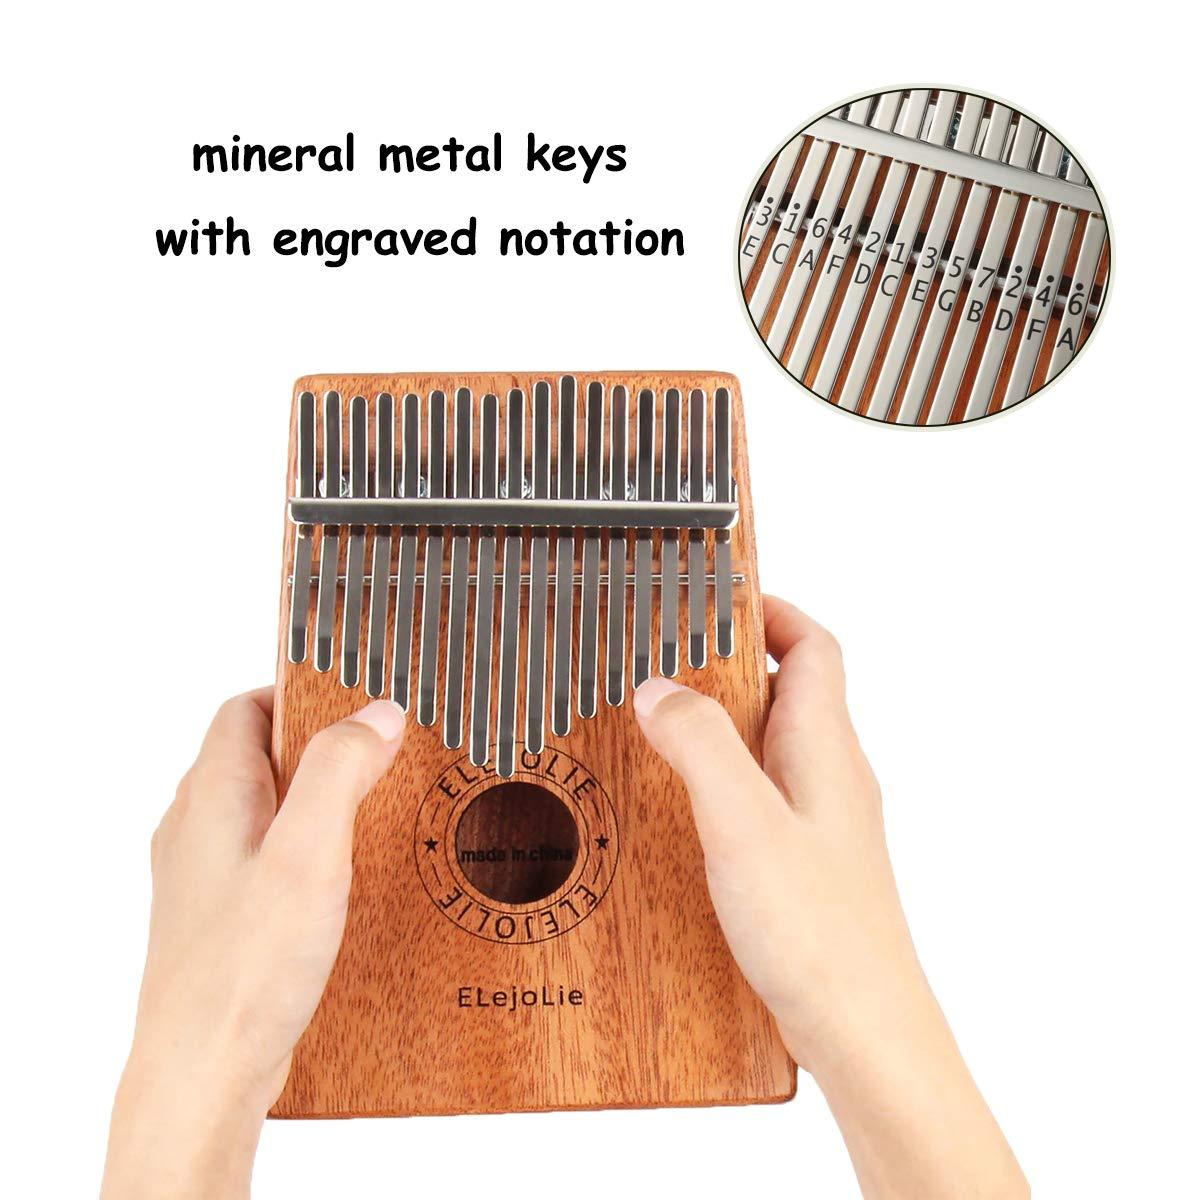 Elejolie Kalimba 17 Keys Thumb Piano Portable Beginner Piano Entry Finger Piano Mahogany Wood Best Gift for You by Elejolie (Image #3)